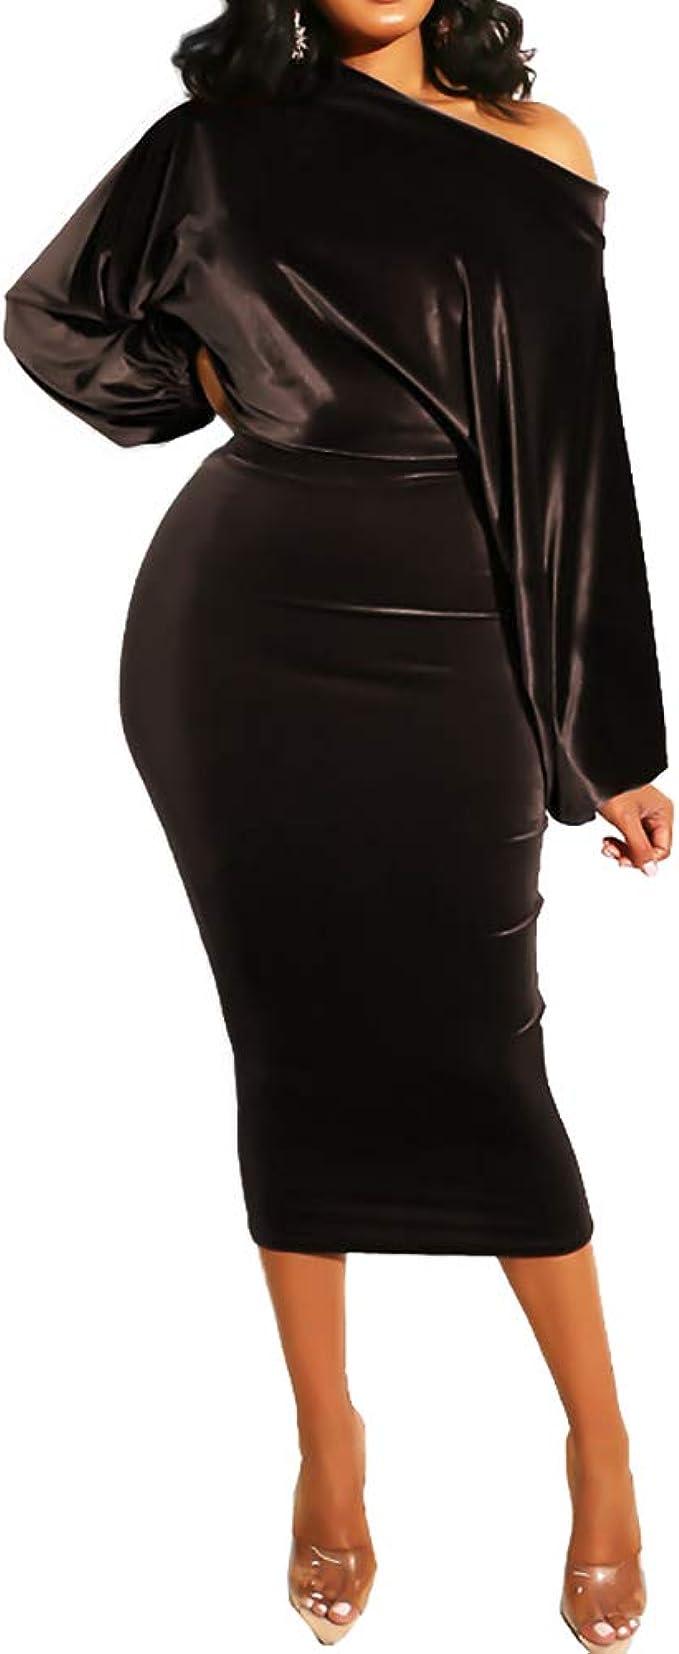 One Shoulder Dress Pencil Midi Party Club Bodycon Evening Cocktail Dresses Women